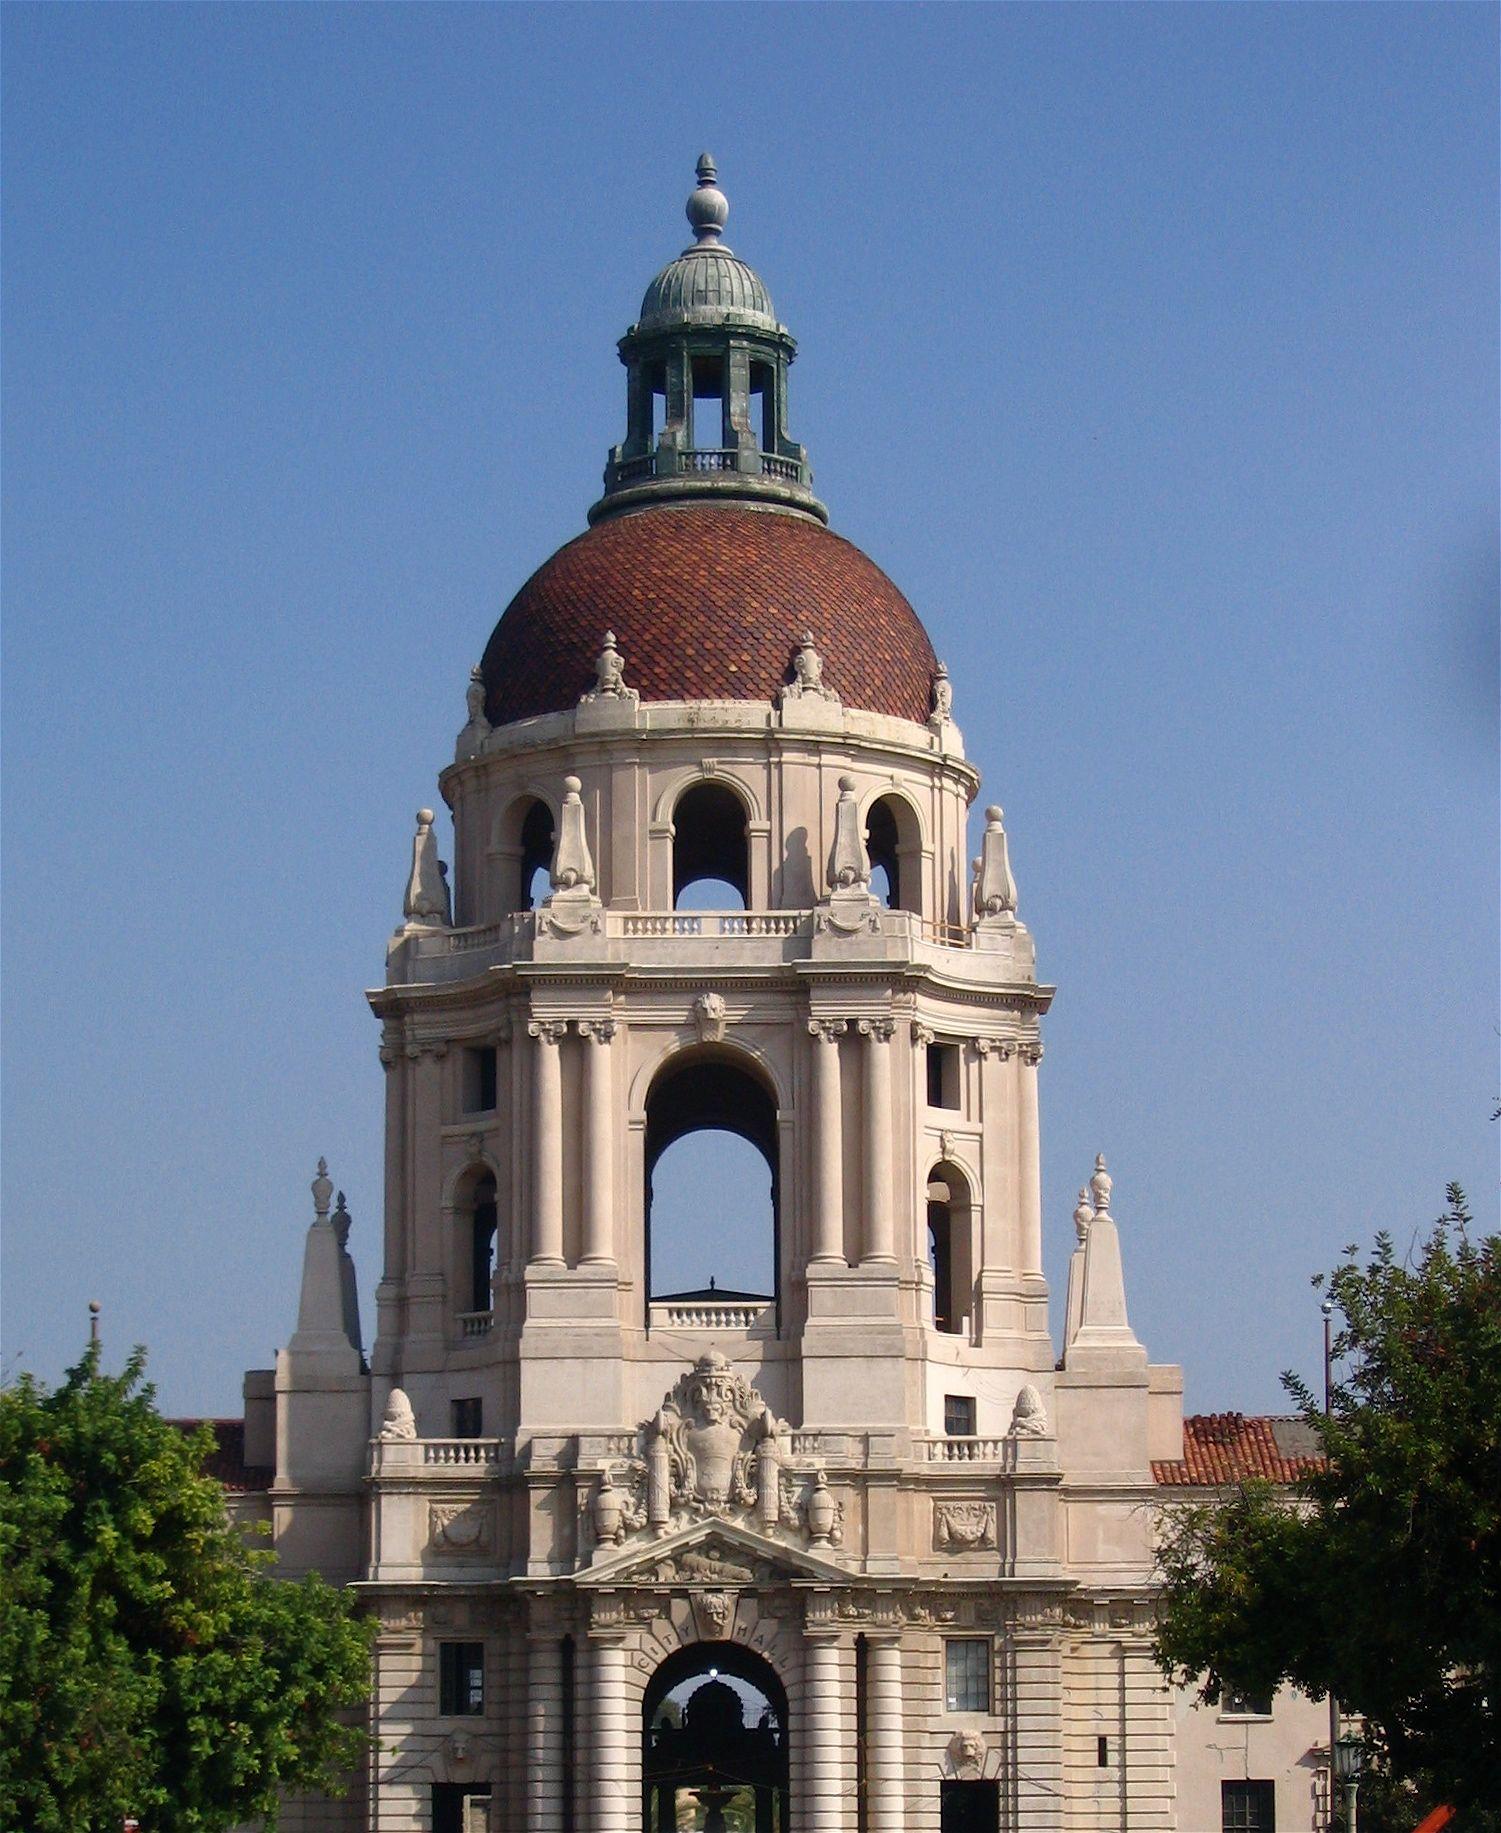 Elaborate Pasadena City Hall In Pasadena California Is Also An Example Of The Gran Pasadena City Hall Mediterranean Revival Architecture Mediterranean Revival